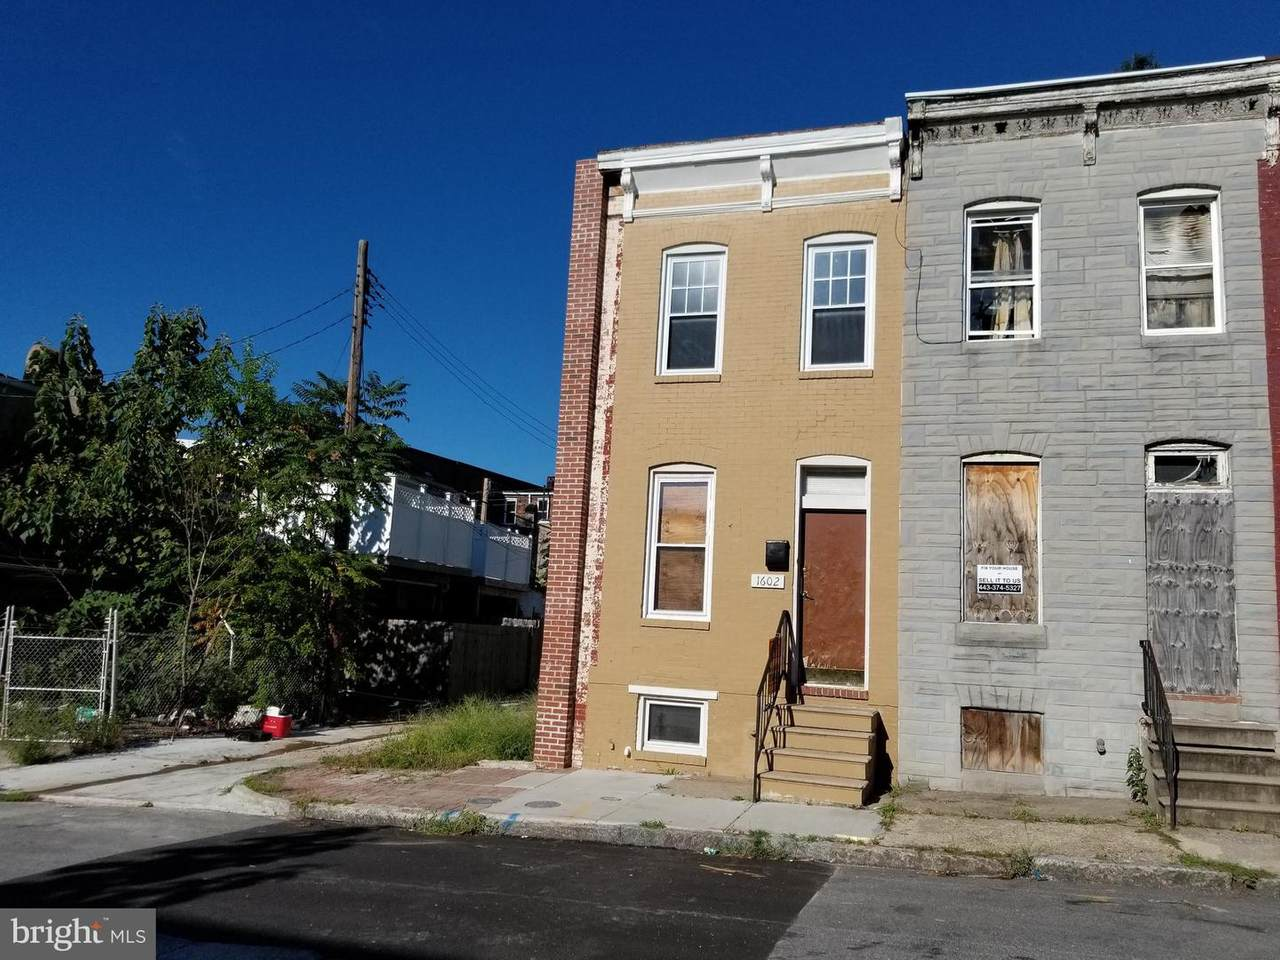 1602 Regester Street - Photo 1